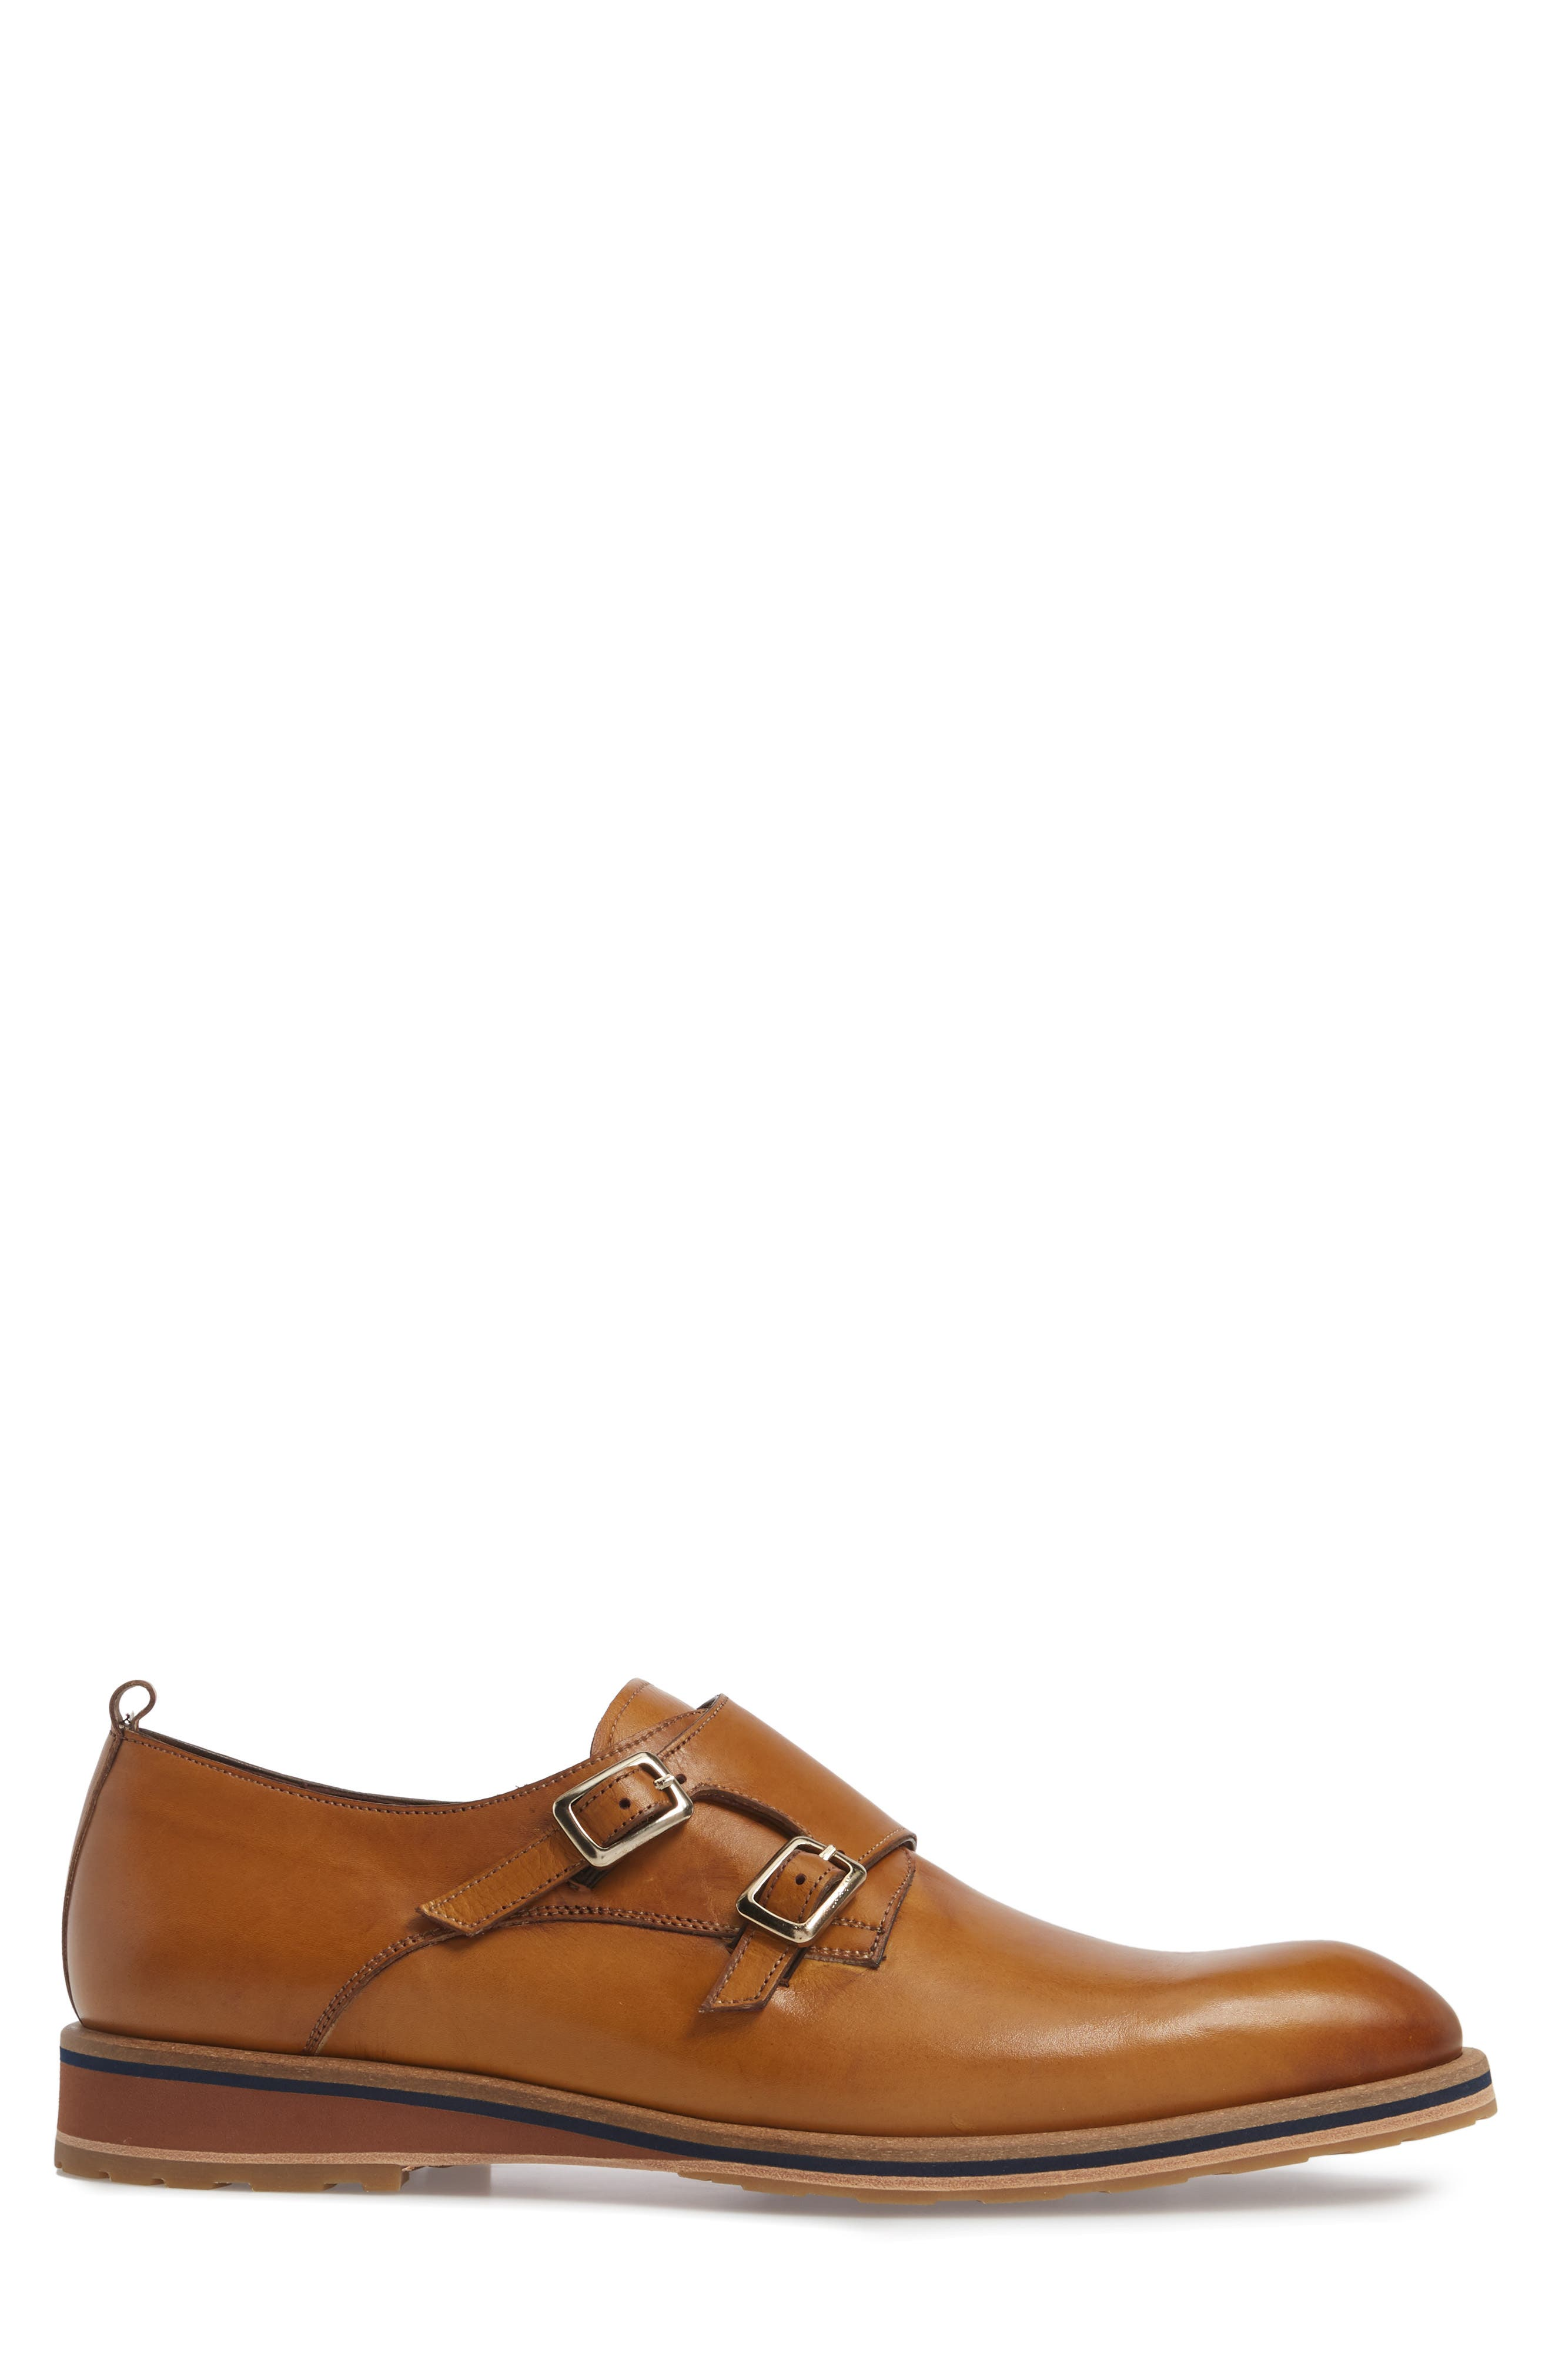 Apolo Double Buckle Monk Shoe,                             Alternate thumbnail 3, color,                             Honey Leather